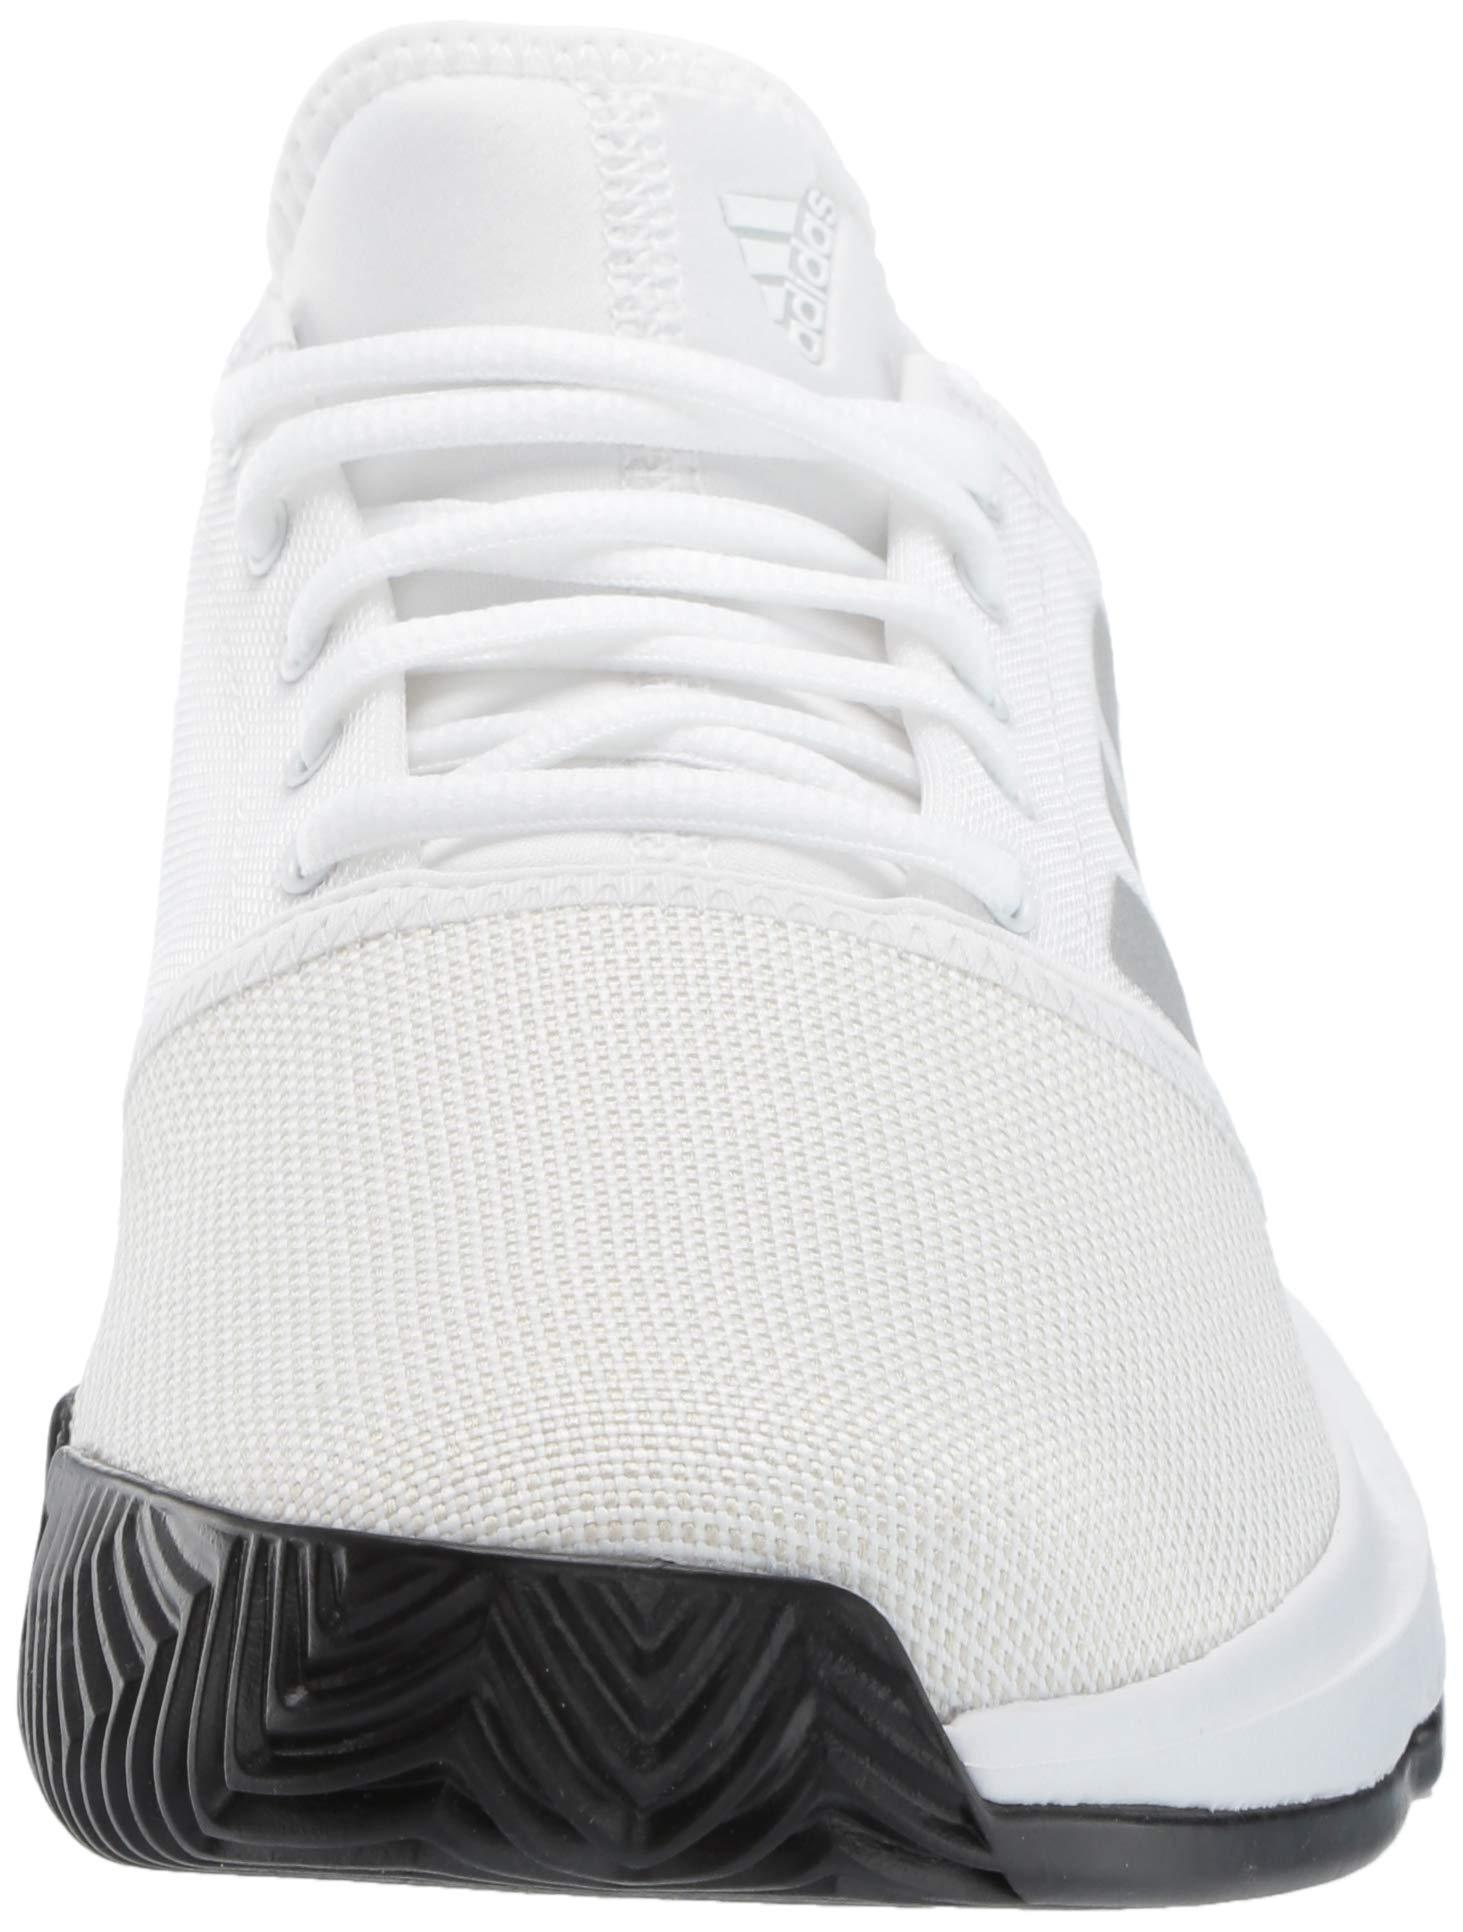 adidas Men's Gamecourt, White/Matte Silver/Black, 7.5 M US by adidas (Image #4)